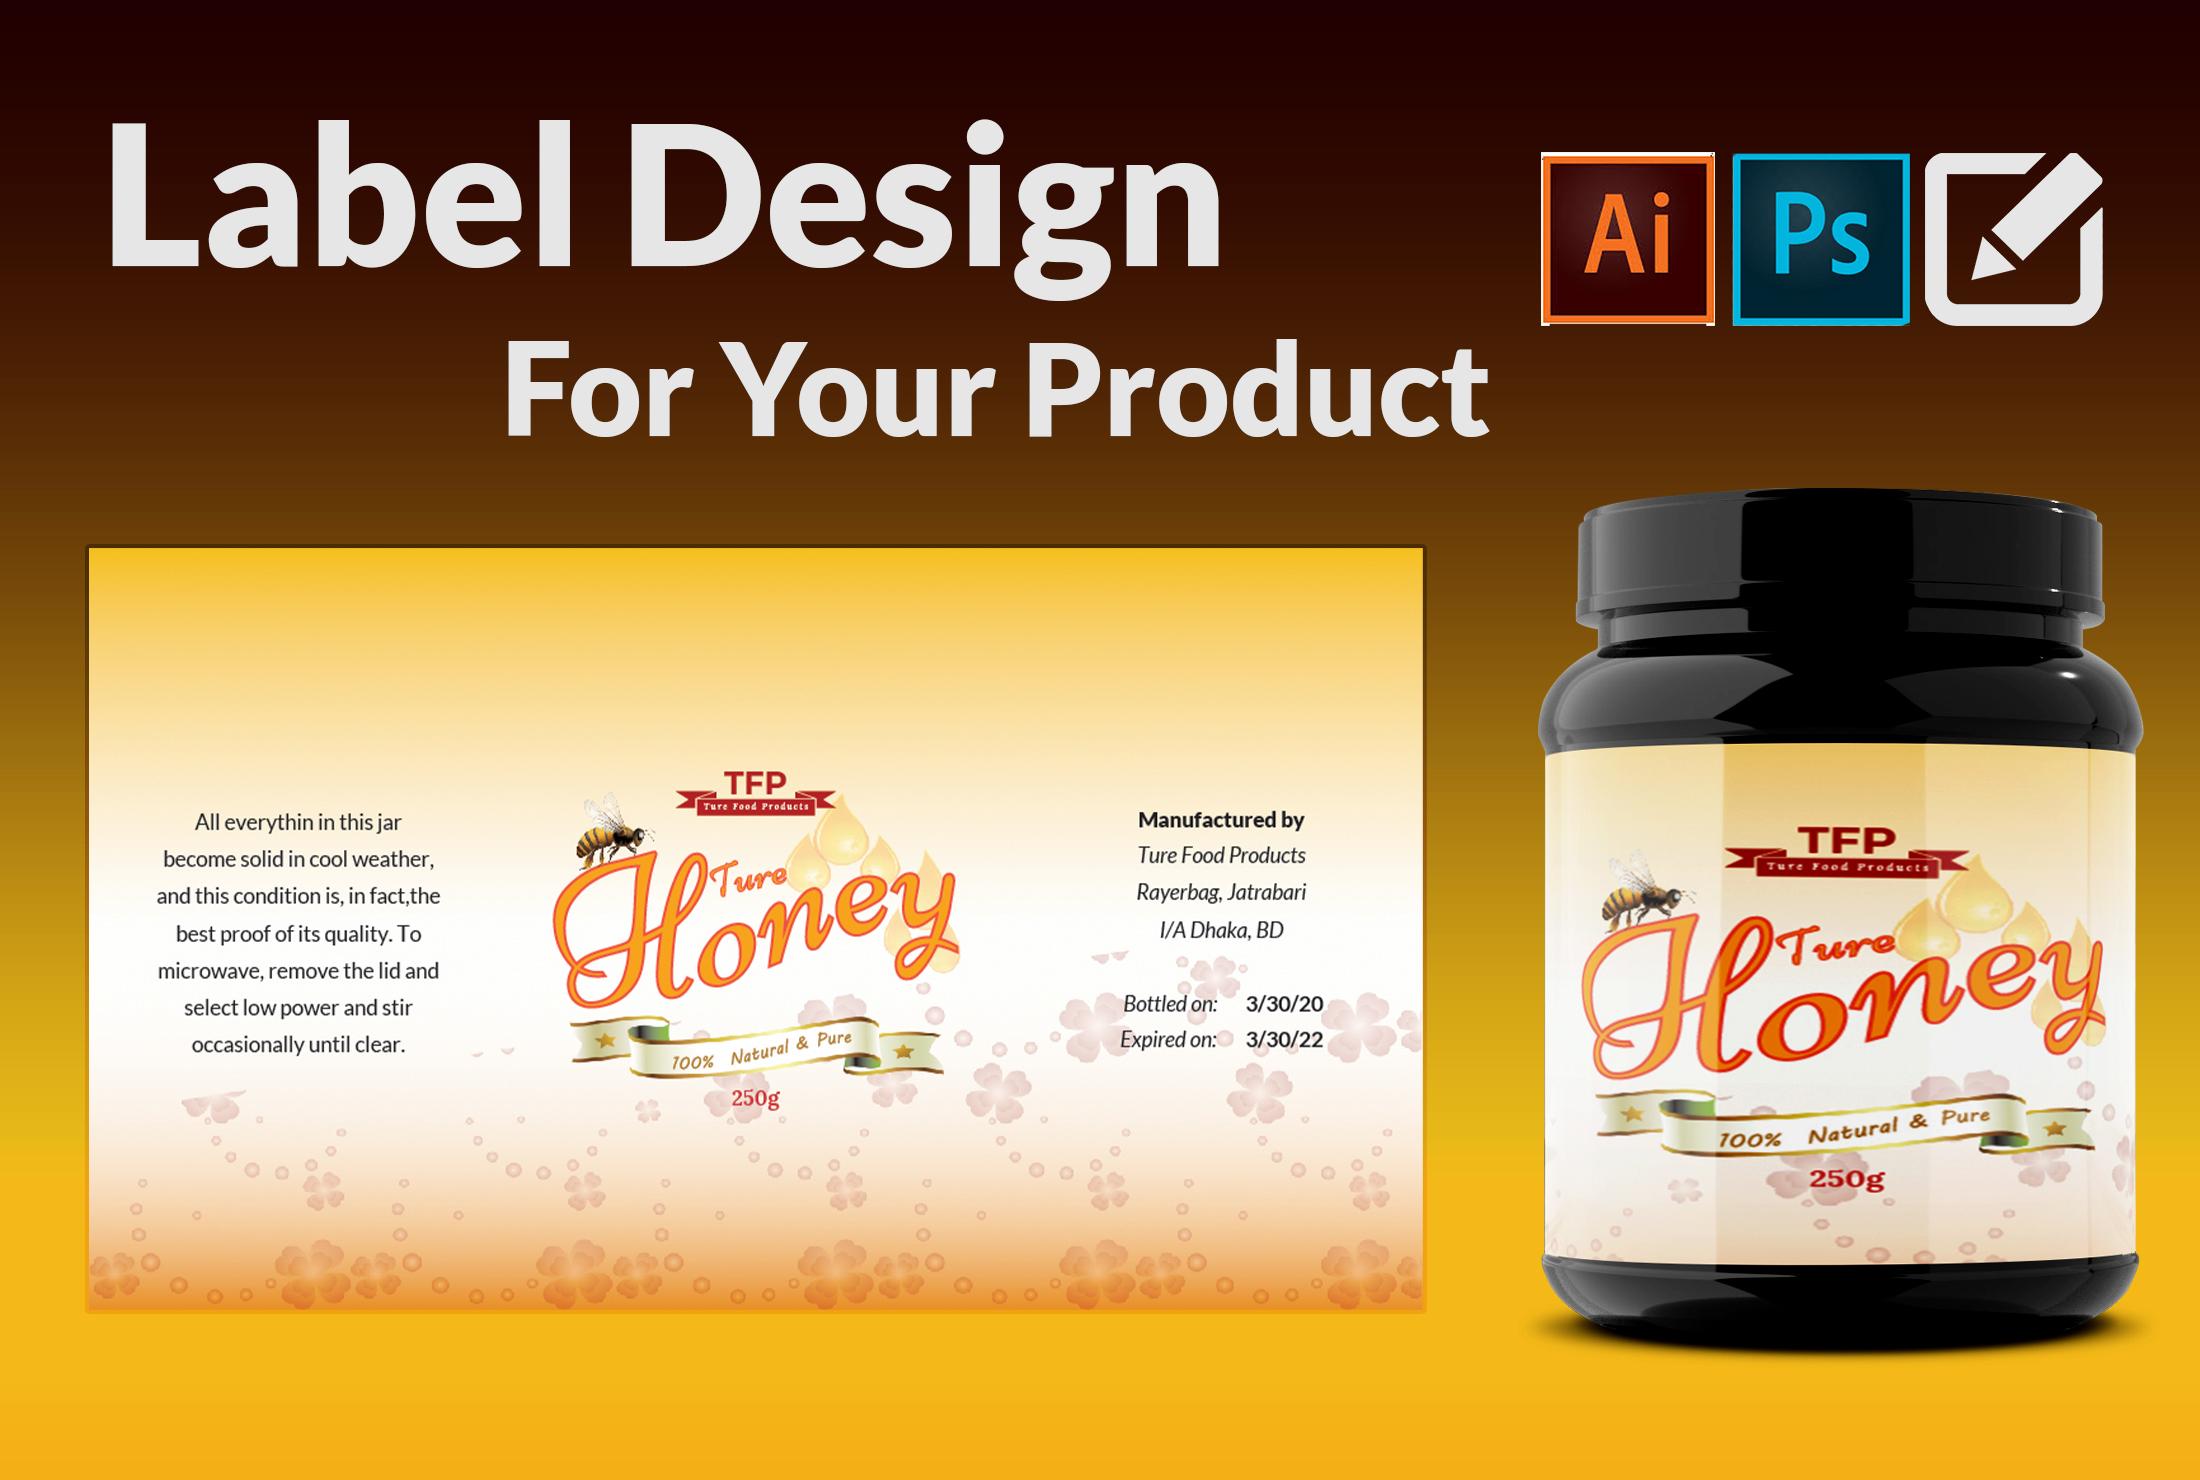 I will do bottle label design and jar label design within 24 hours